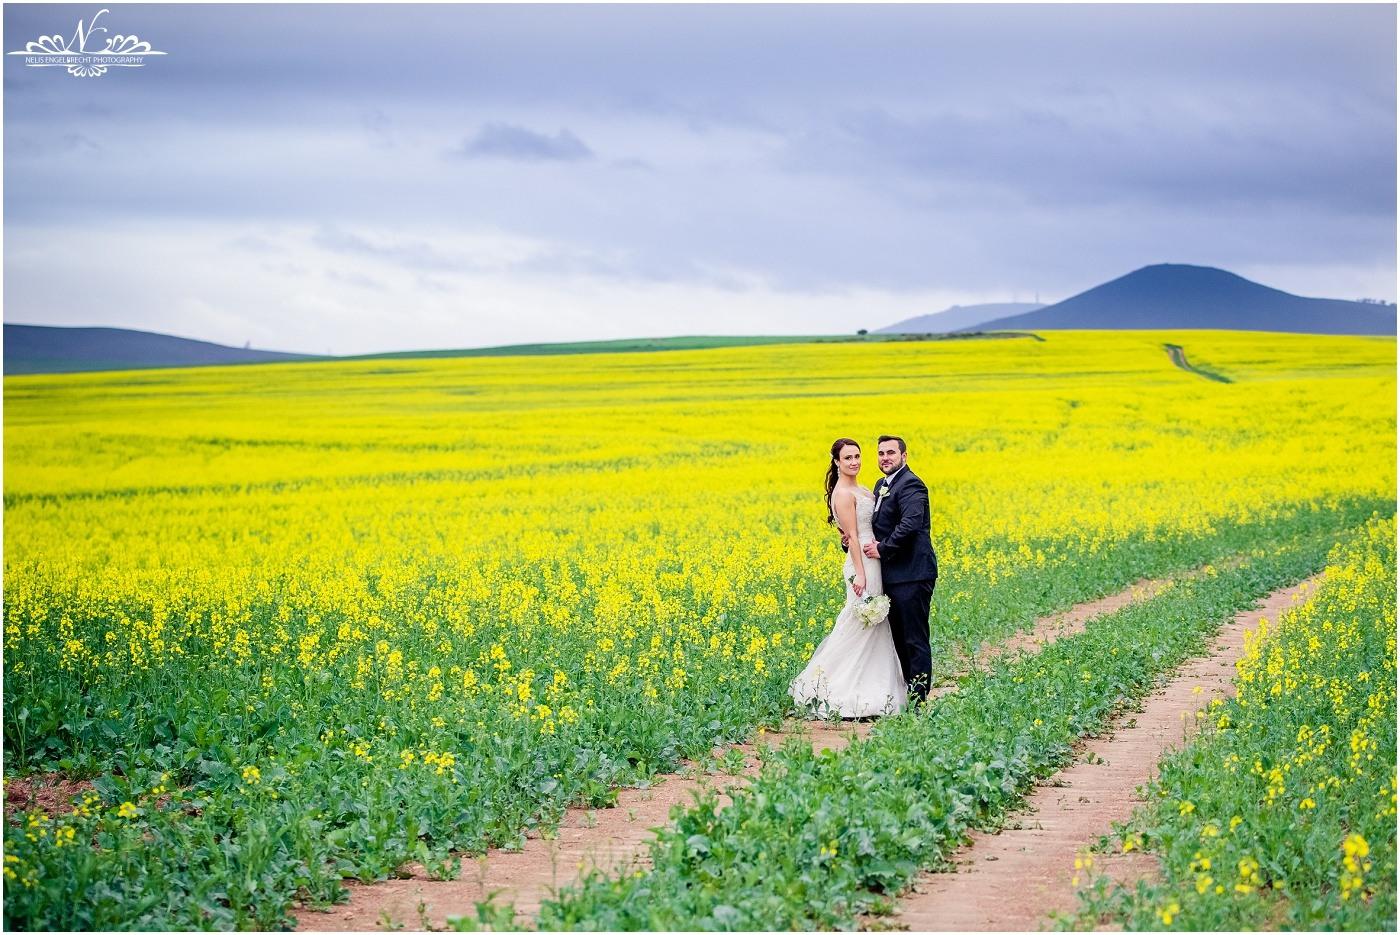 Eensgezind-Wedding-Photos-Nelis-Engelbrecht-Photography-128